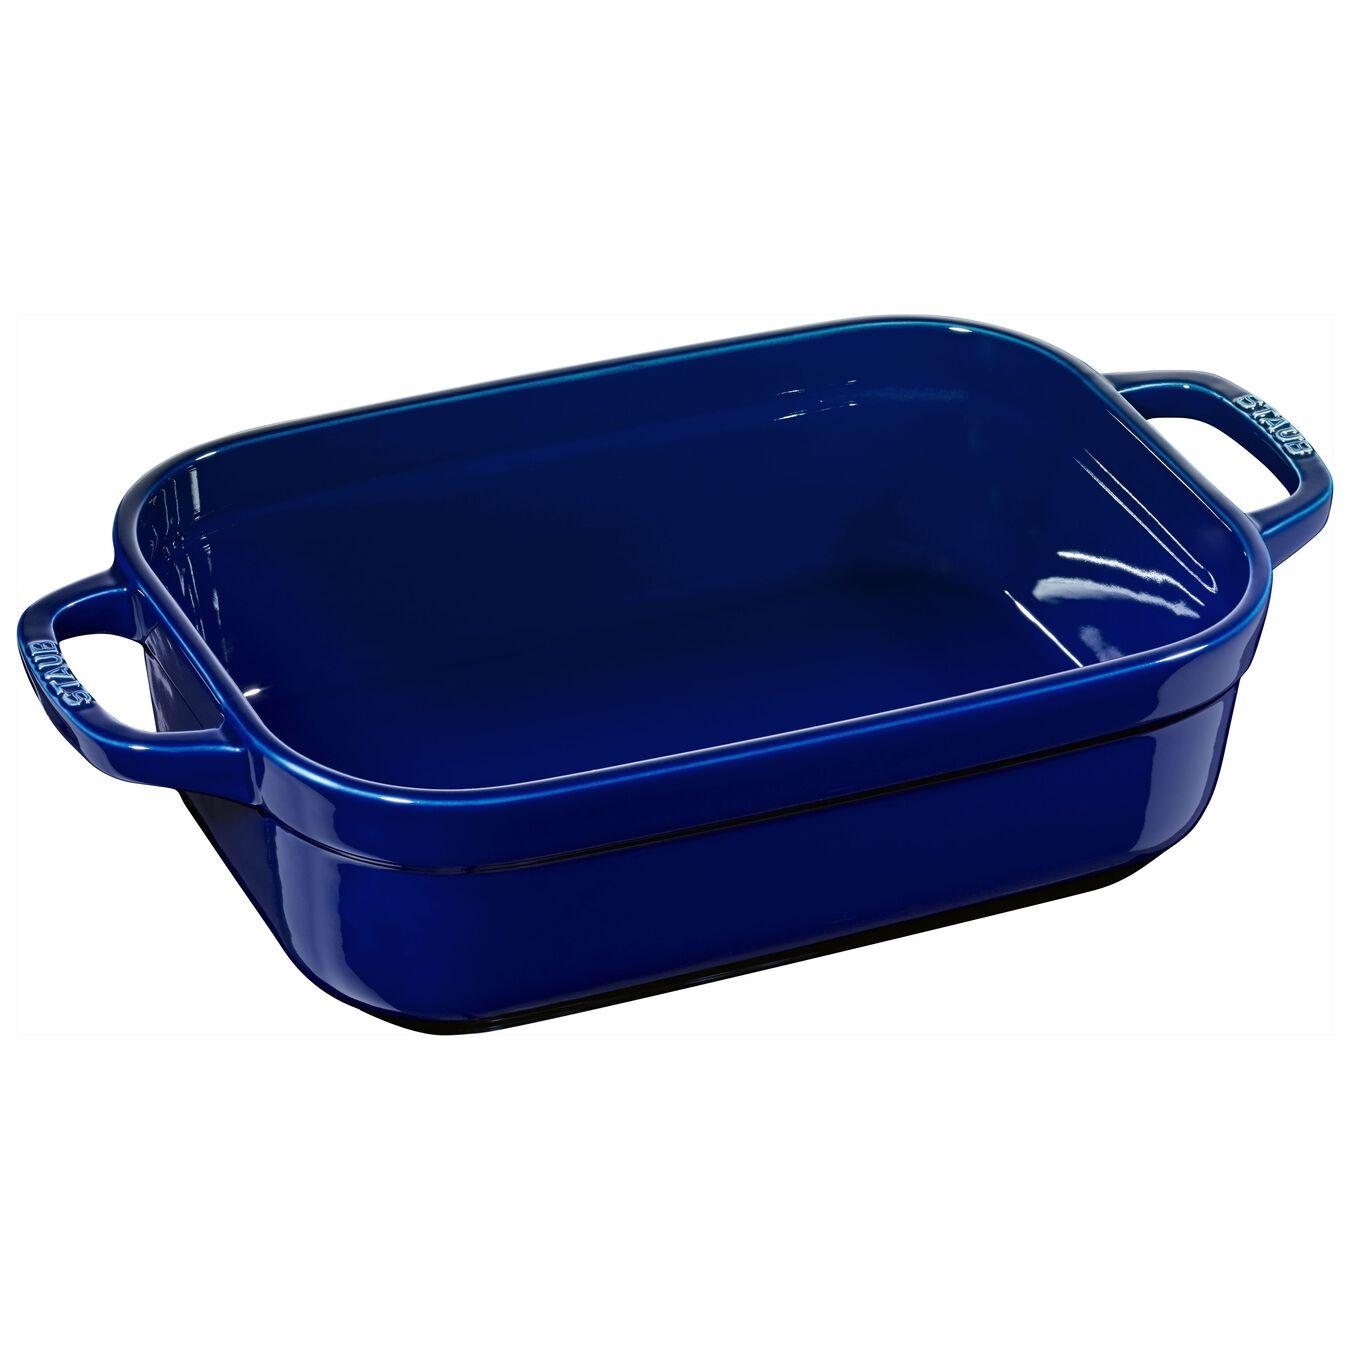 rectangular, Oven dish, dark blue,,large 1